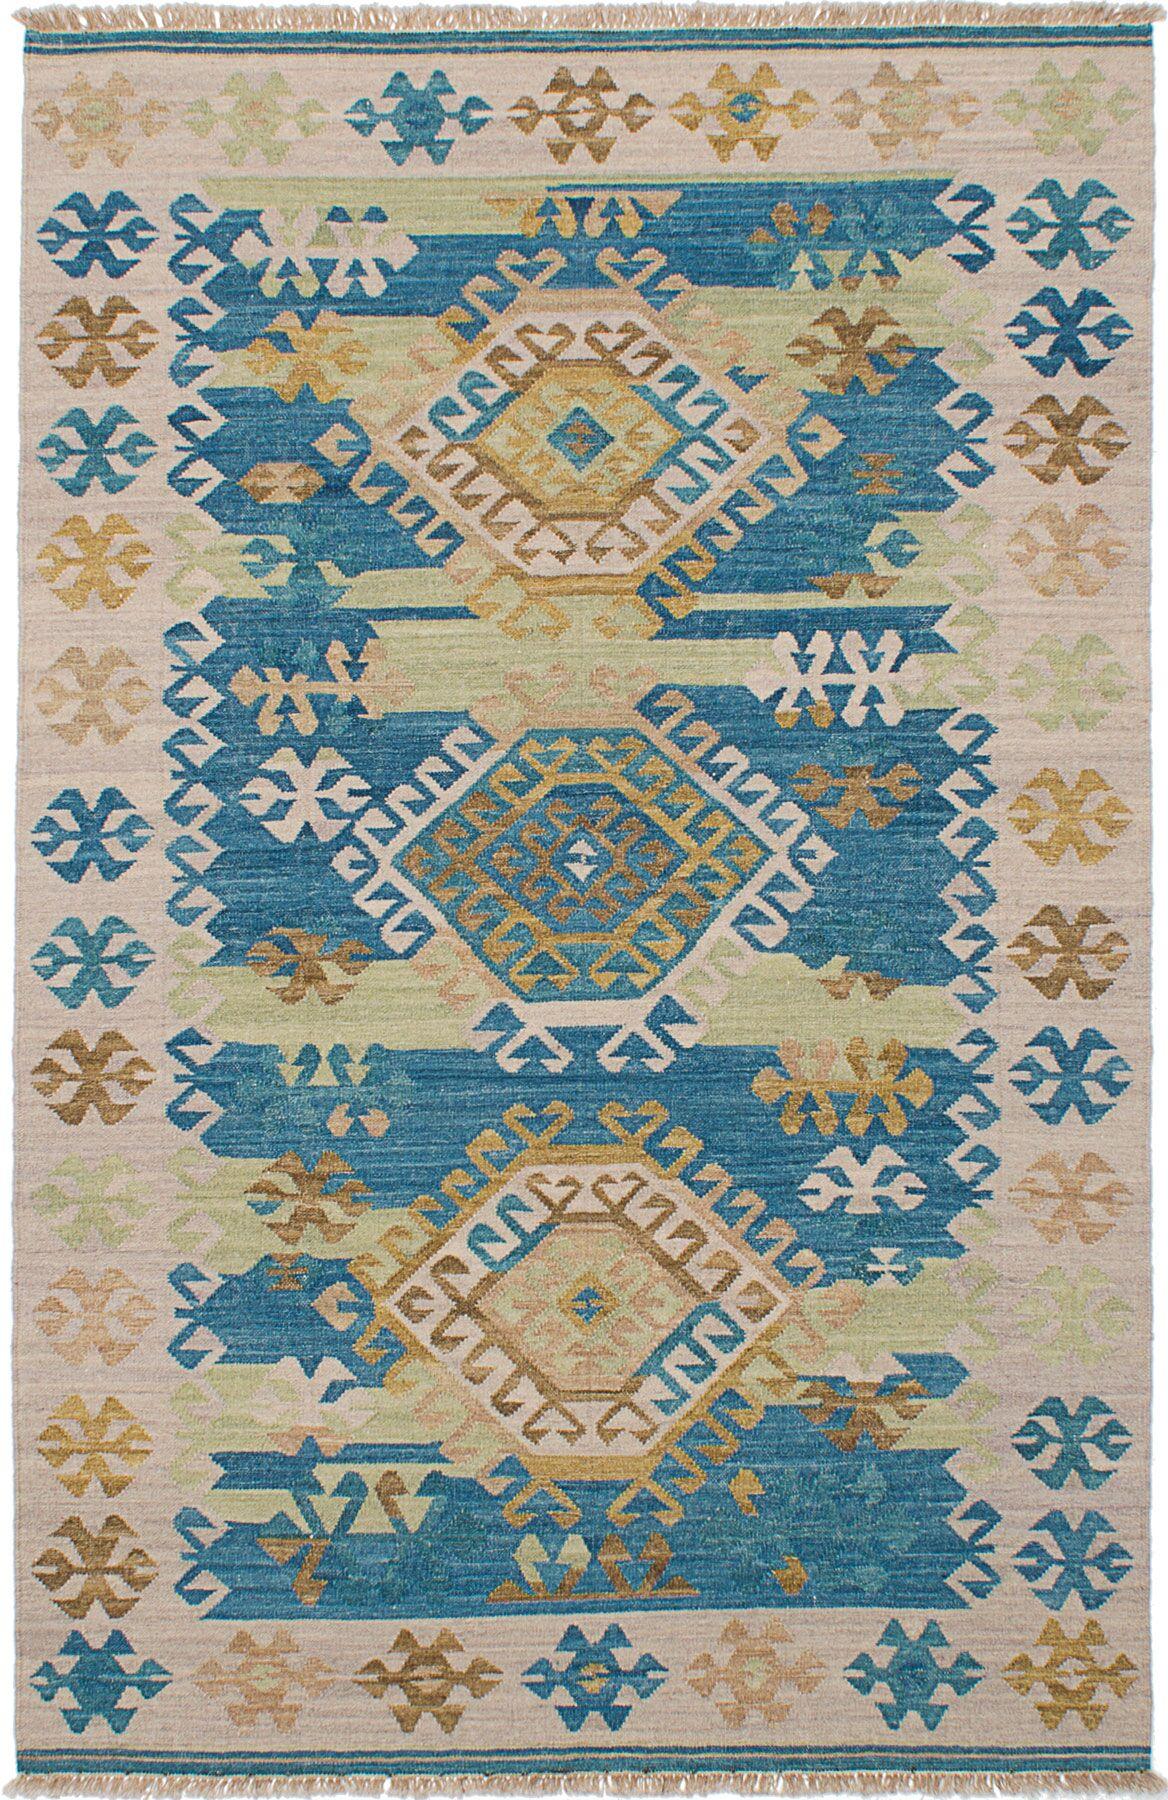 Pavlatka Kilim Hand-Woven Wool Khaki/Turquoise Area Rug Rug Size: Rectangle 5' x 8'